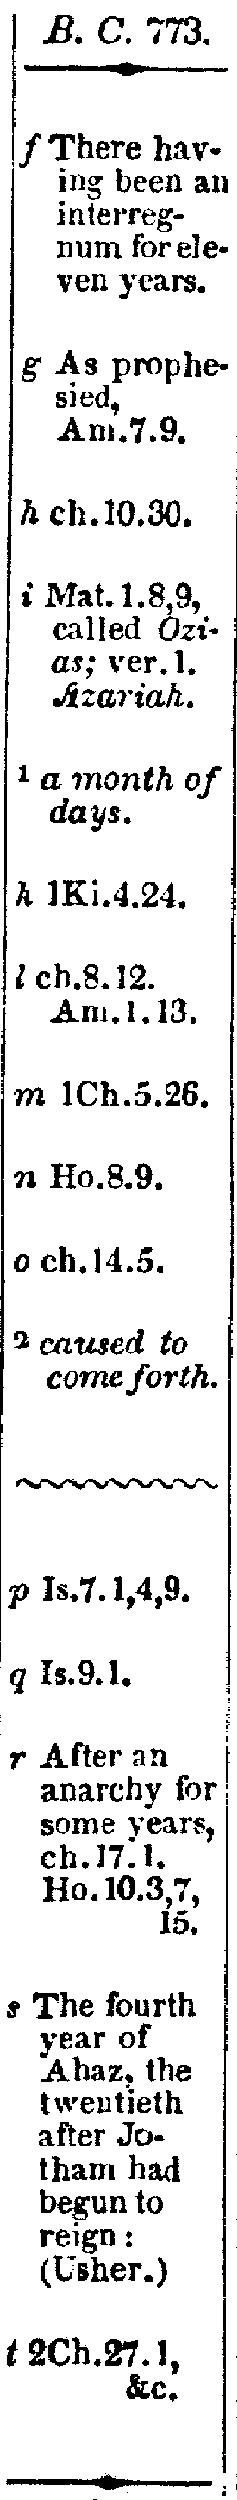 [merged small][merged small][ocr errors][merged small][merged small][merged small][ocr errors][ocr errors][ocr errors][merged small][ocr errors][merged small][ocr errors][merged small][ocr errors]